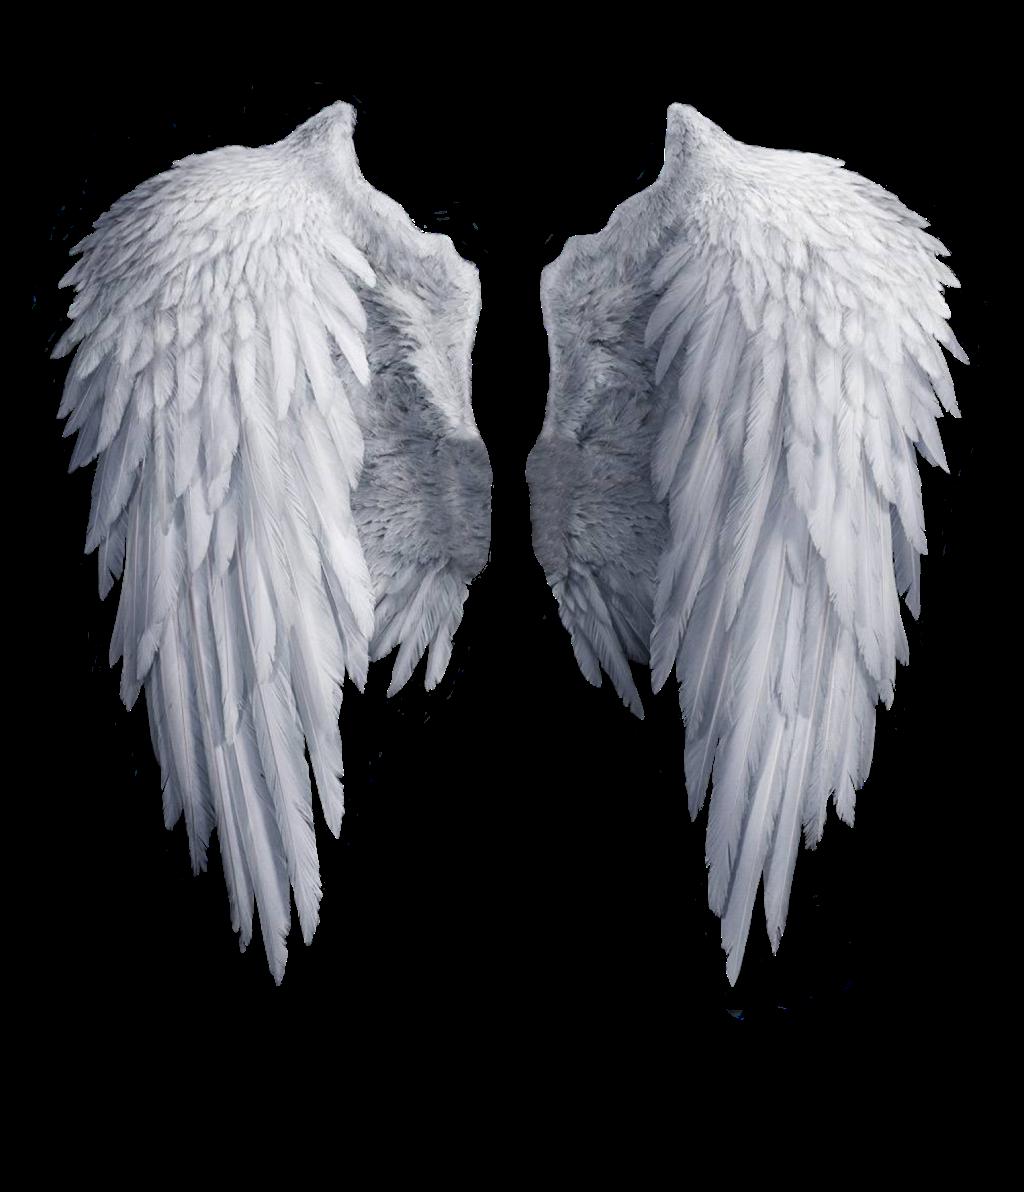 Realistic Angel Wings Png (+).